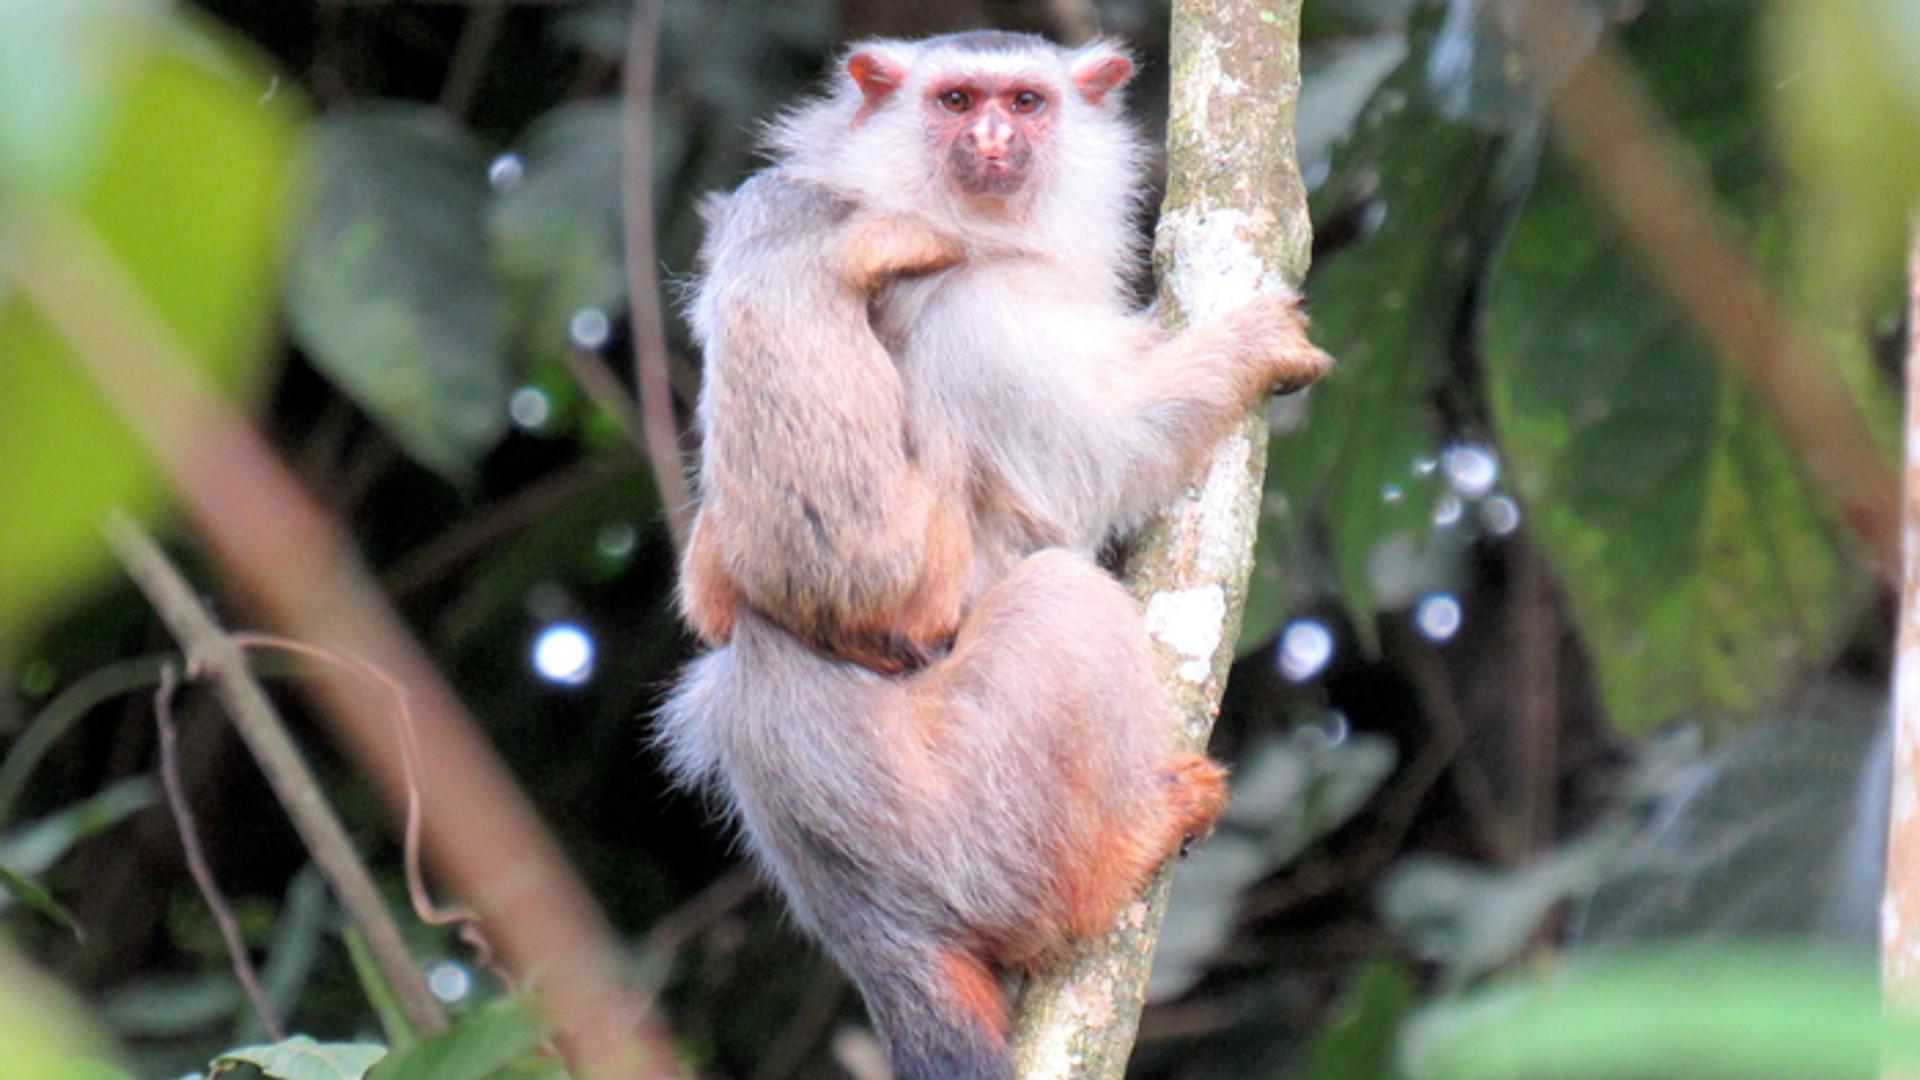 Mico schneideri, nueva especie de primate identificada en Brasil - Sputnik Mundo, 1920, 13.08.2021